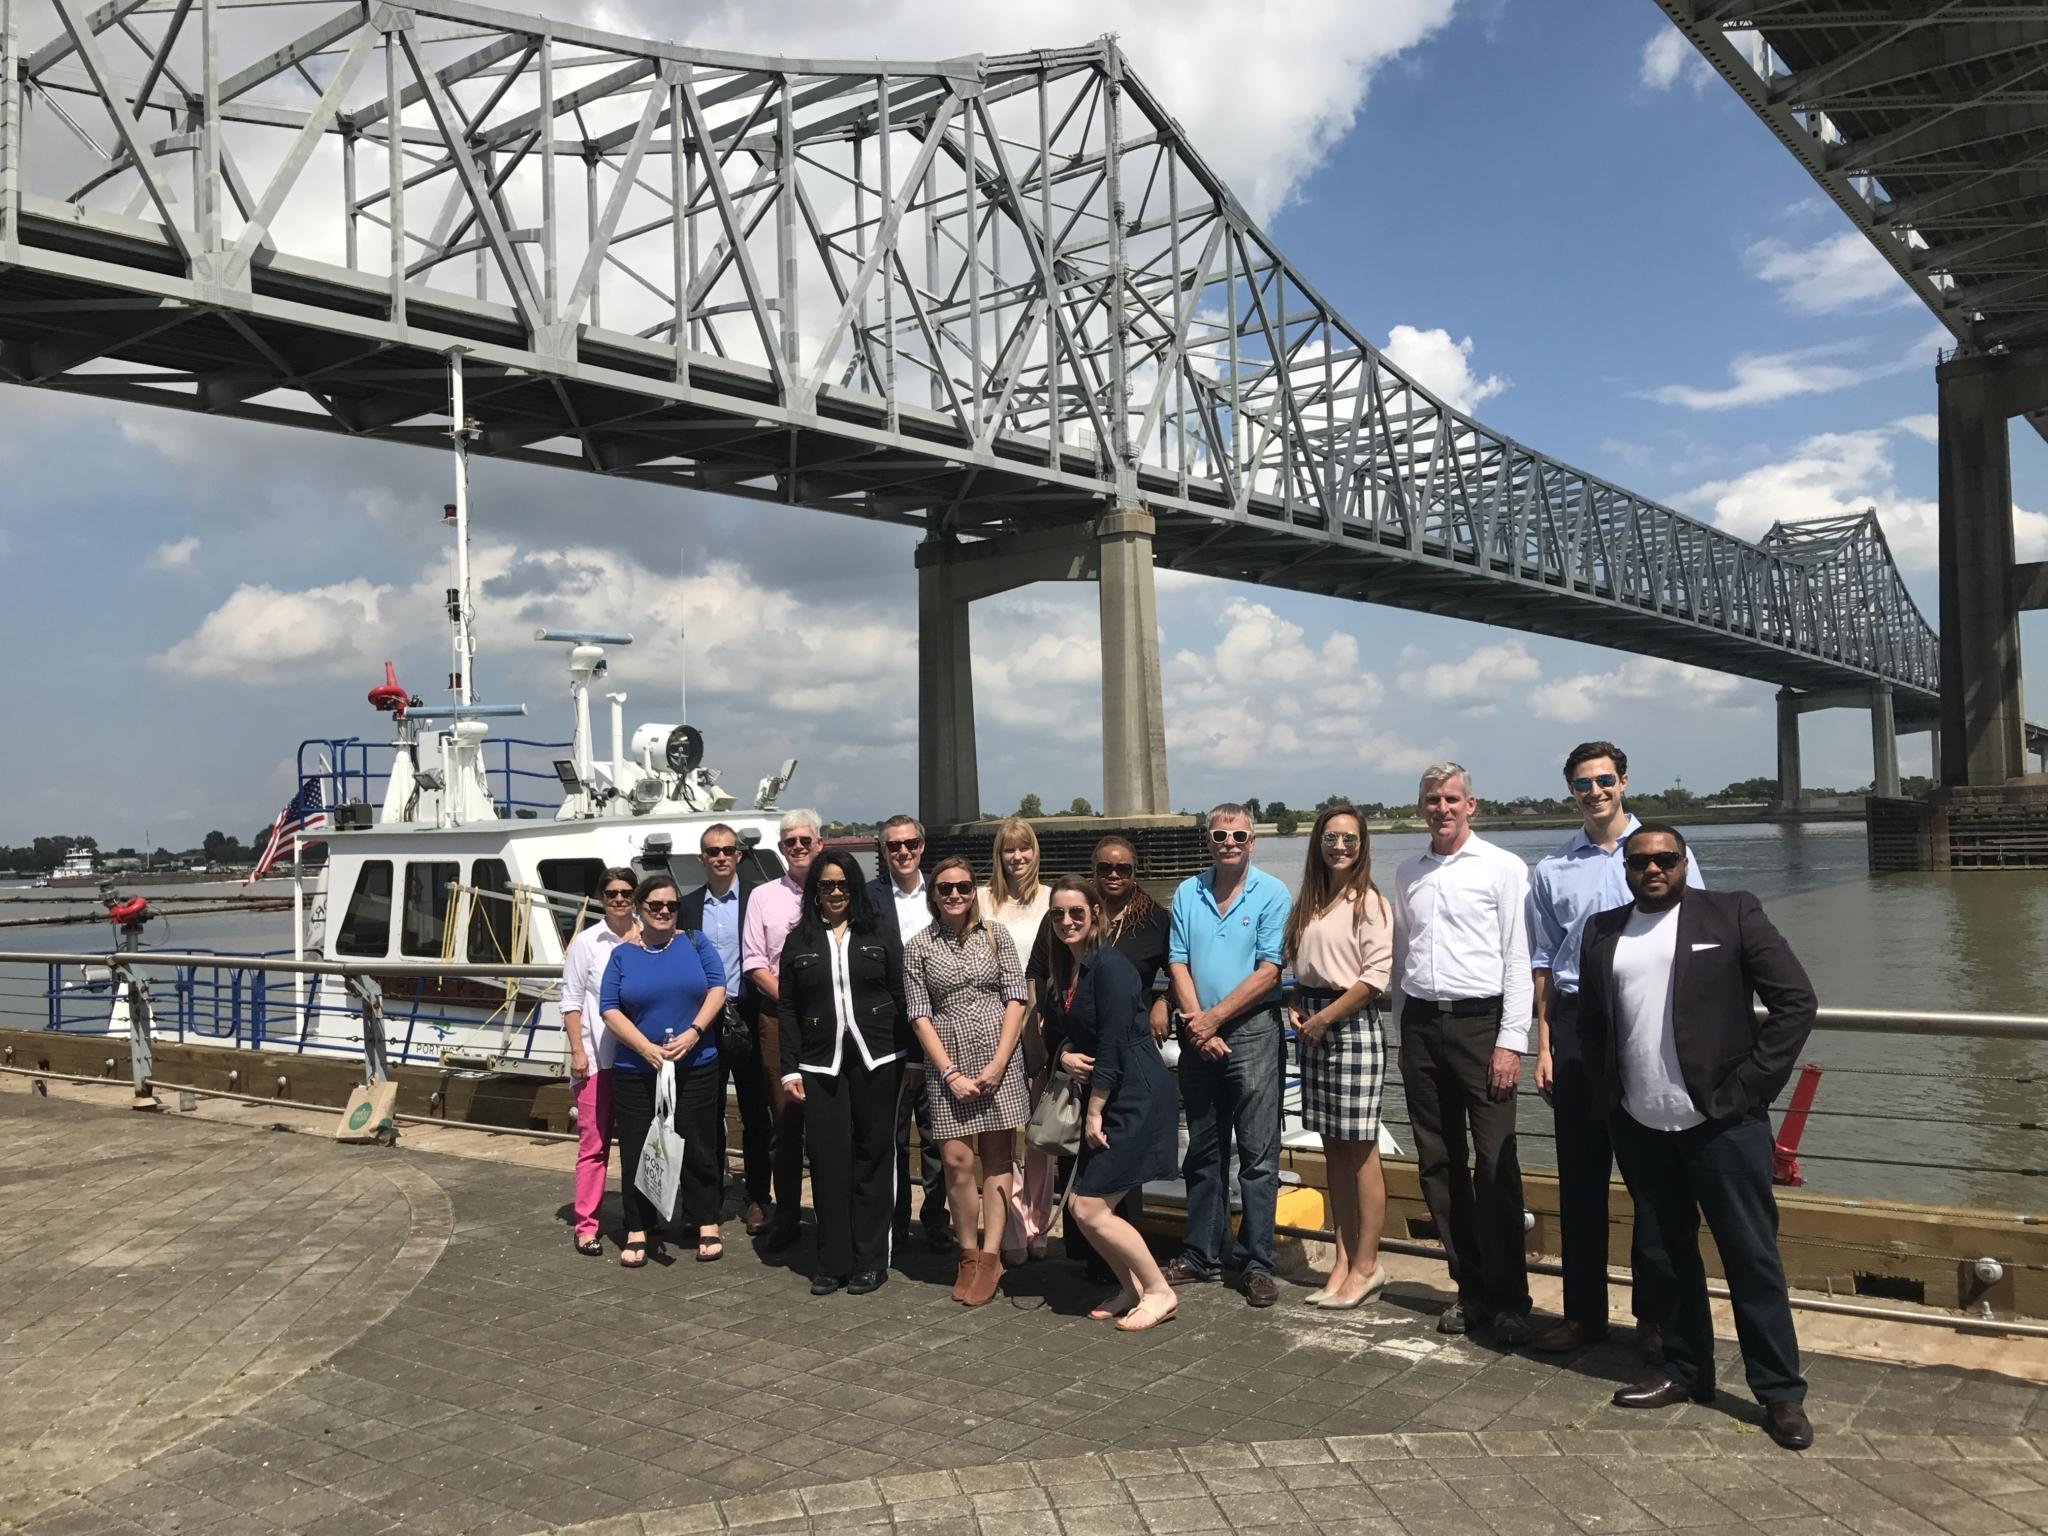 Group Photo at the Port Public Boat Tour